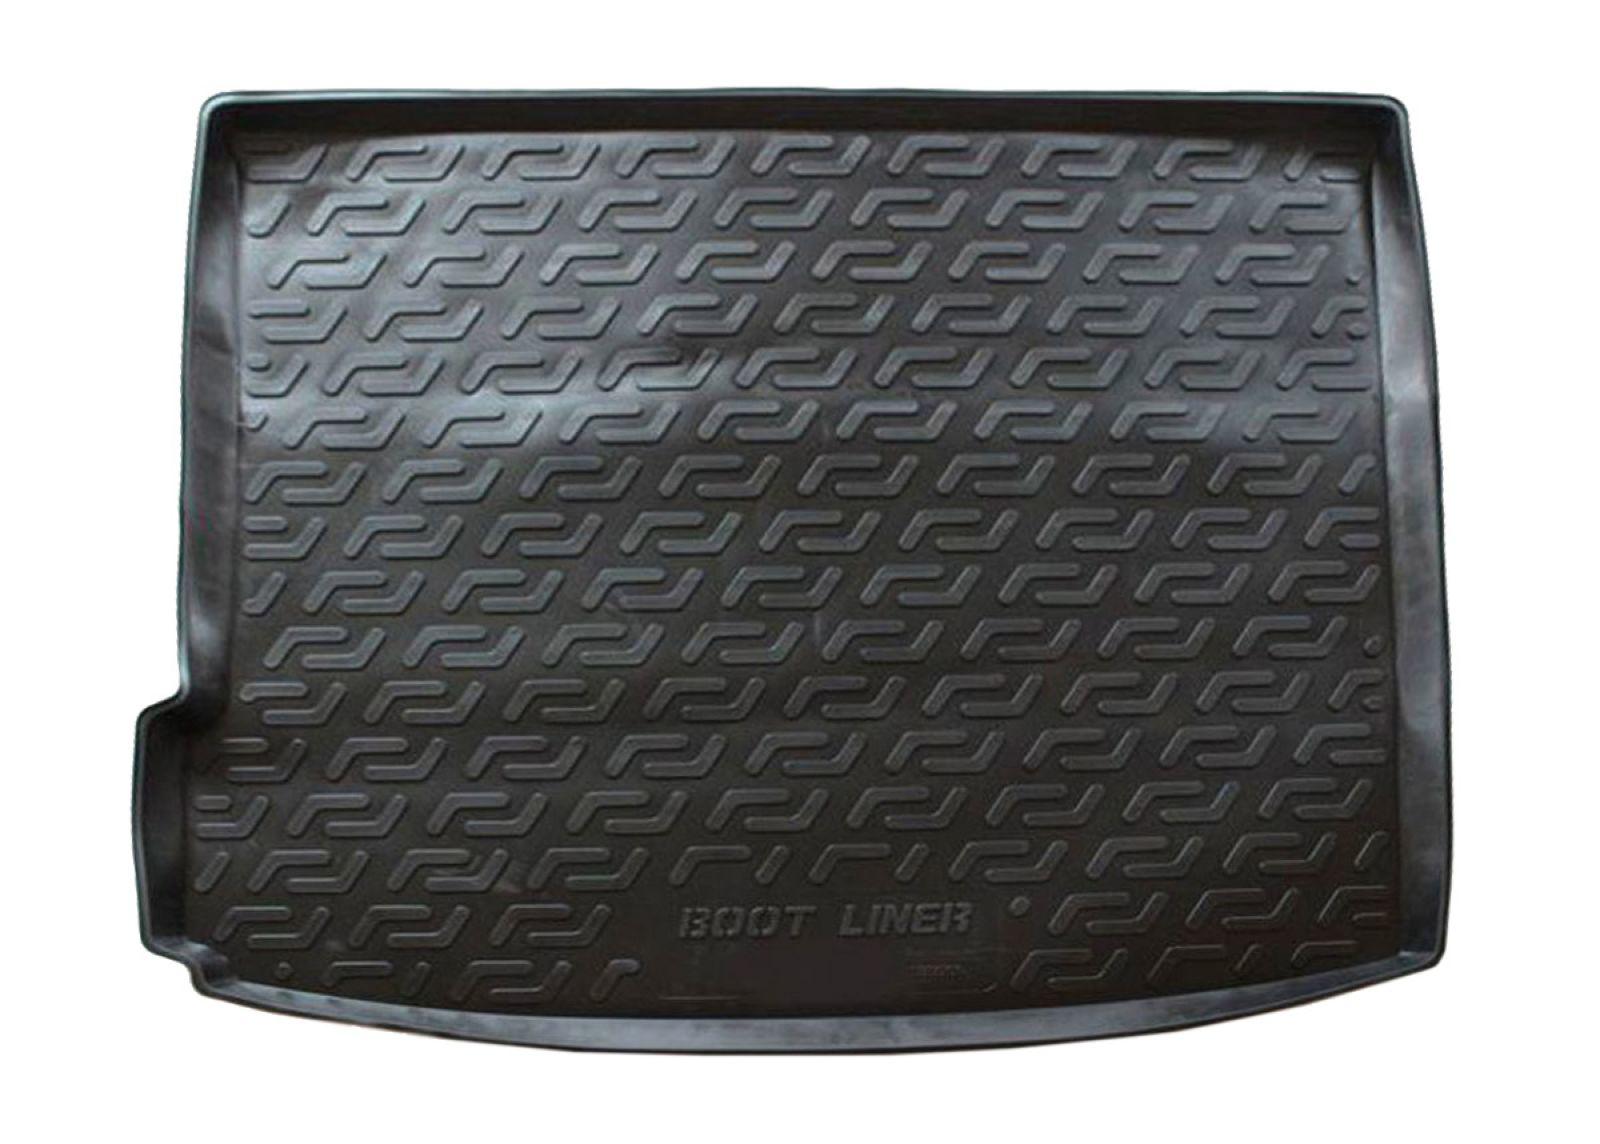 Poza cu Tavita de portbagaj STANDART, BMW X6, 2007-2019